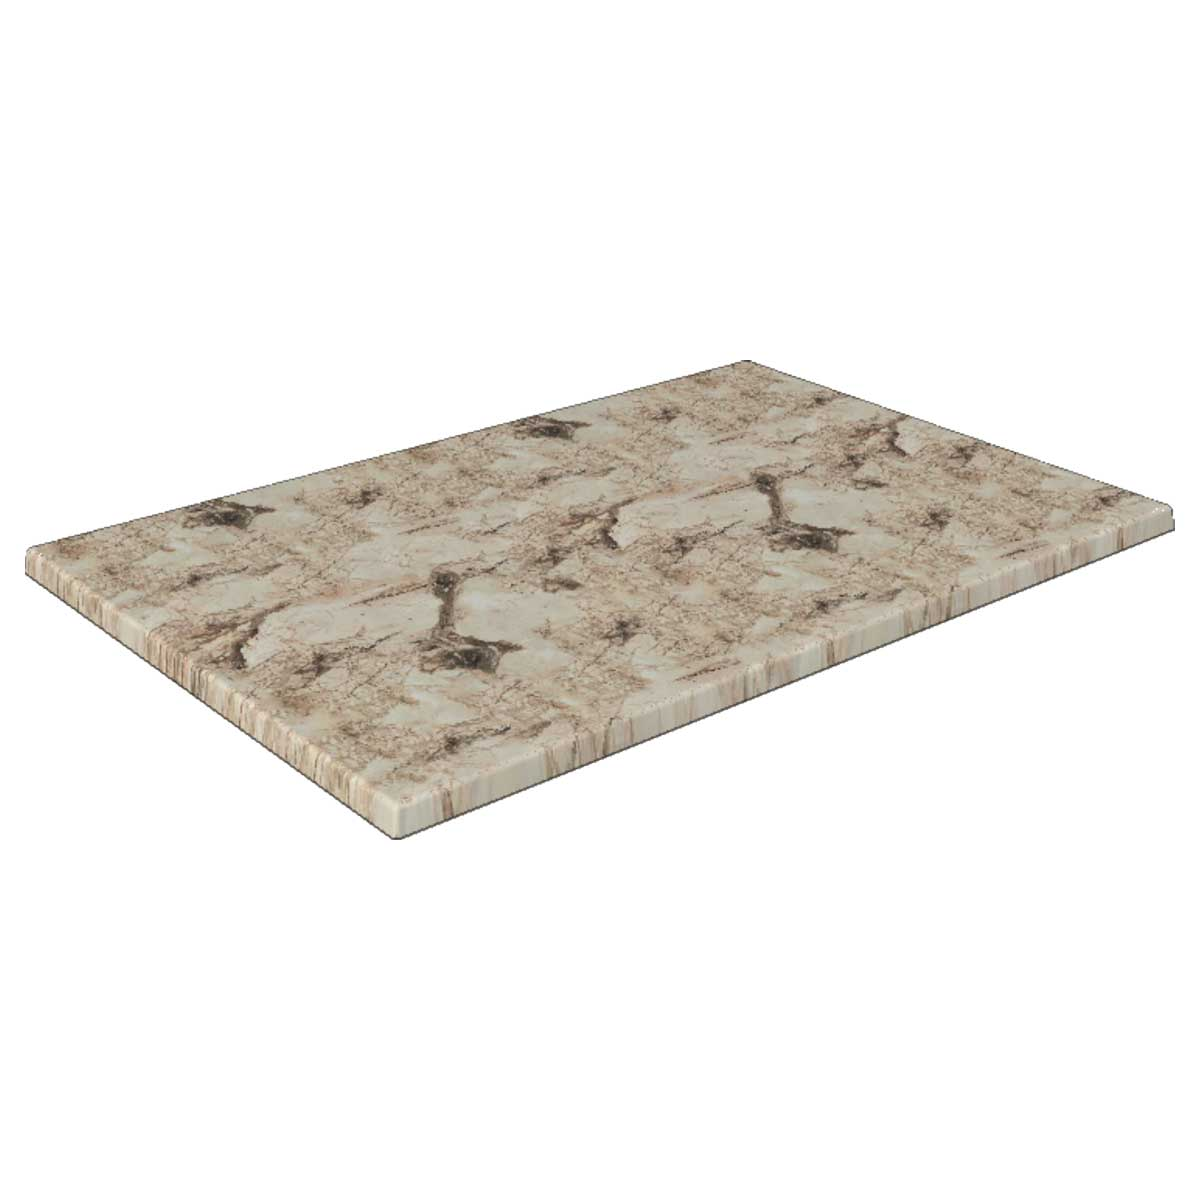 TICLA E120X80 209 - https://www.werzalit.com/fr/produit/plateau-de-table-classic-werzalit-e-110x70-209-marmor-almeria/